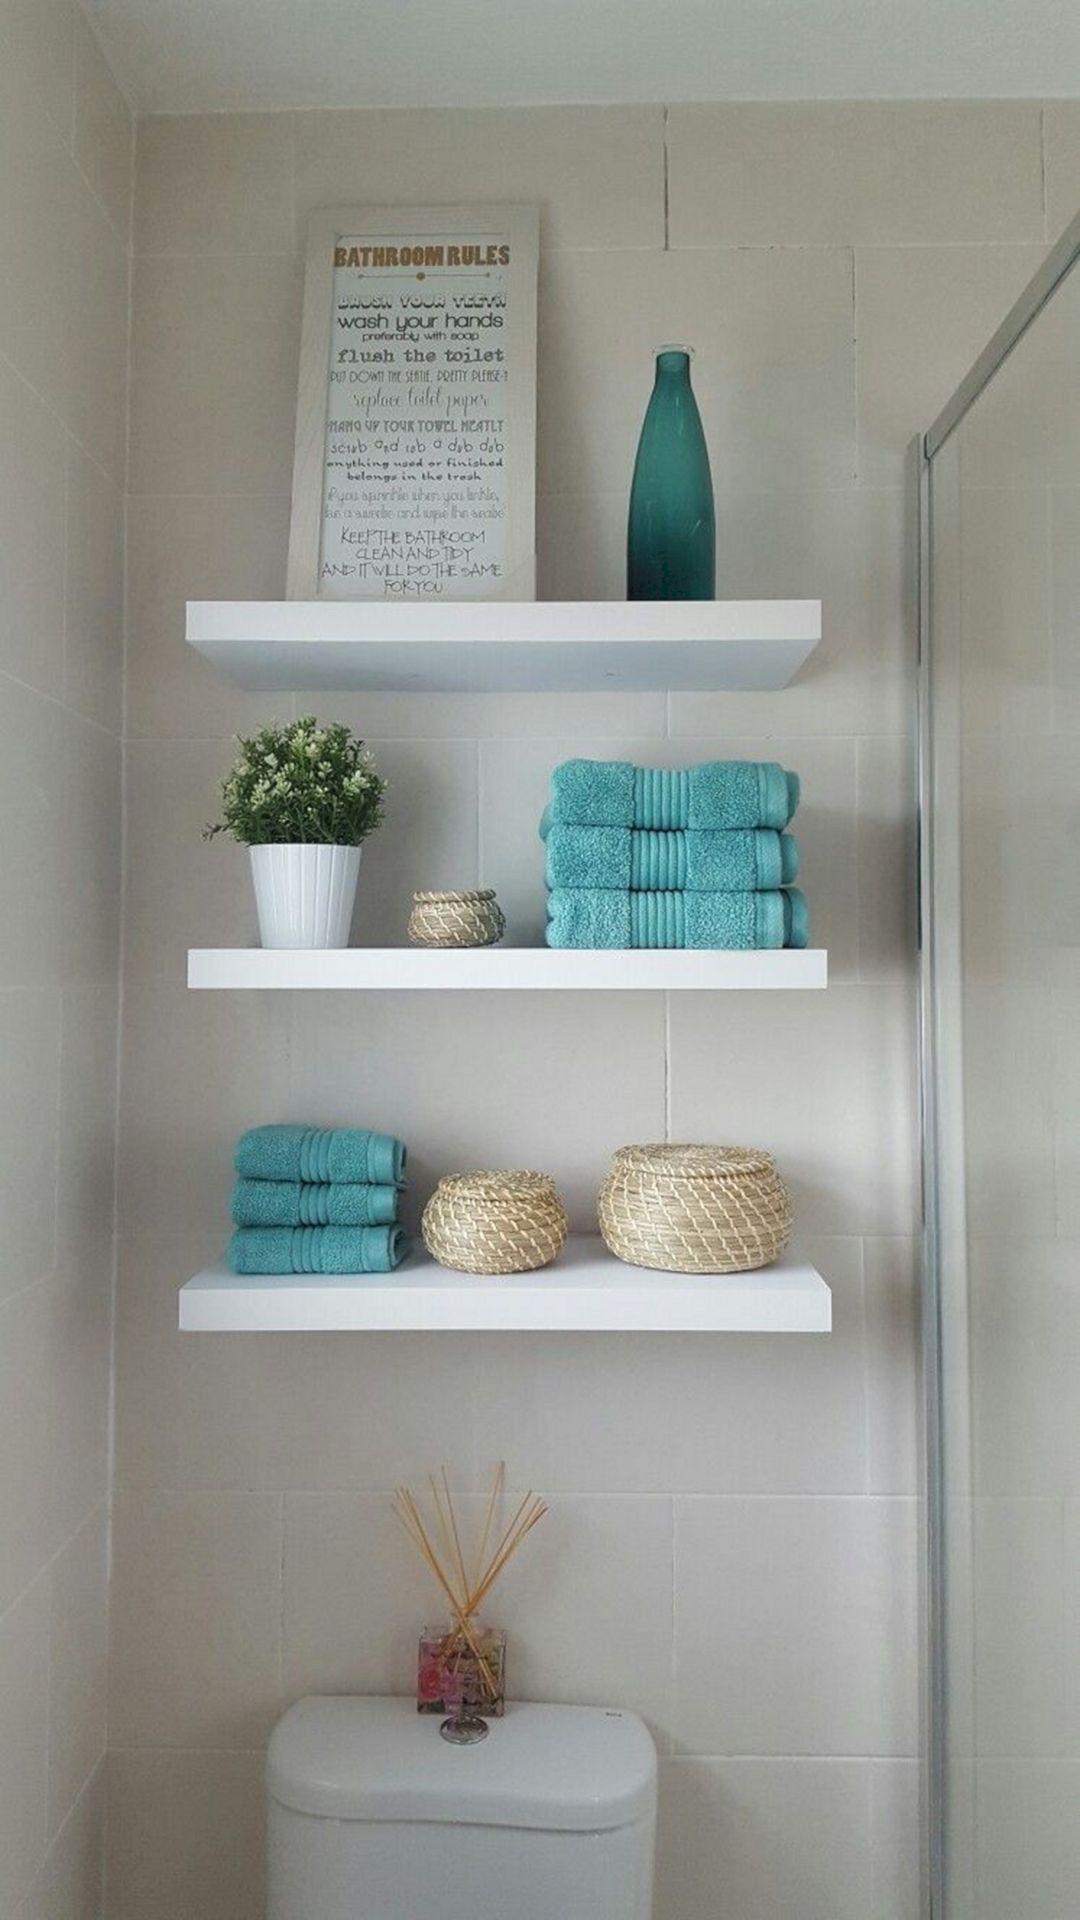 10 beautiful corner wall shelves ideas for your bathroom